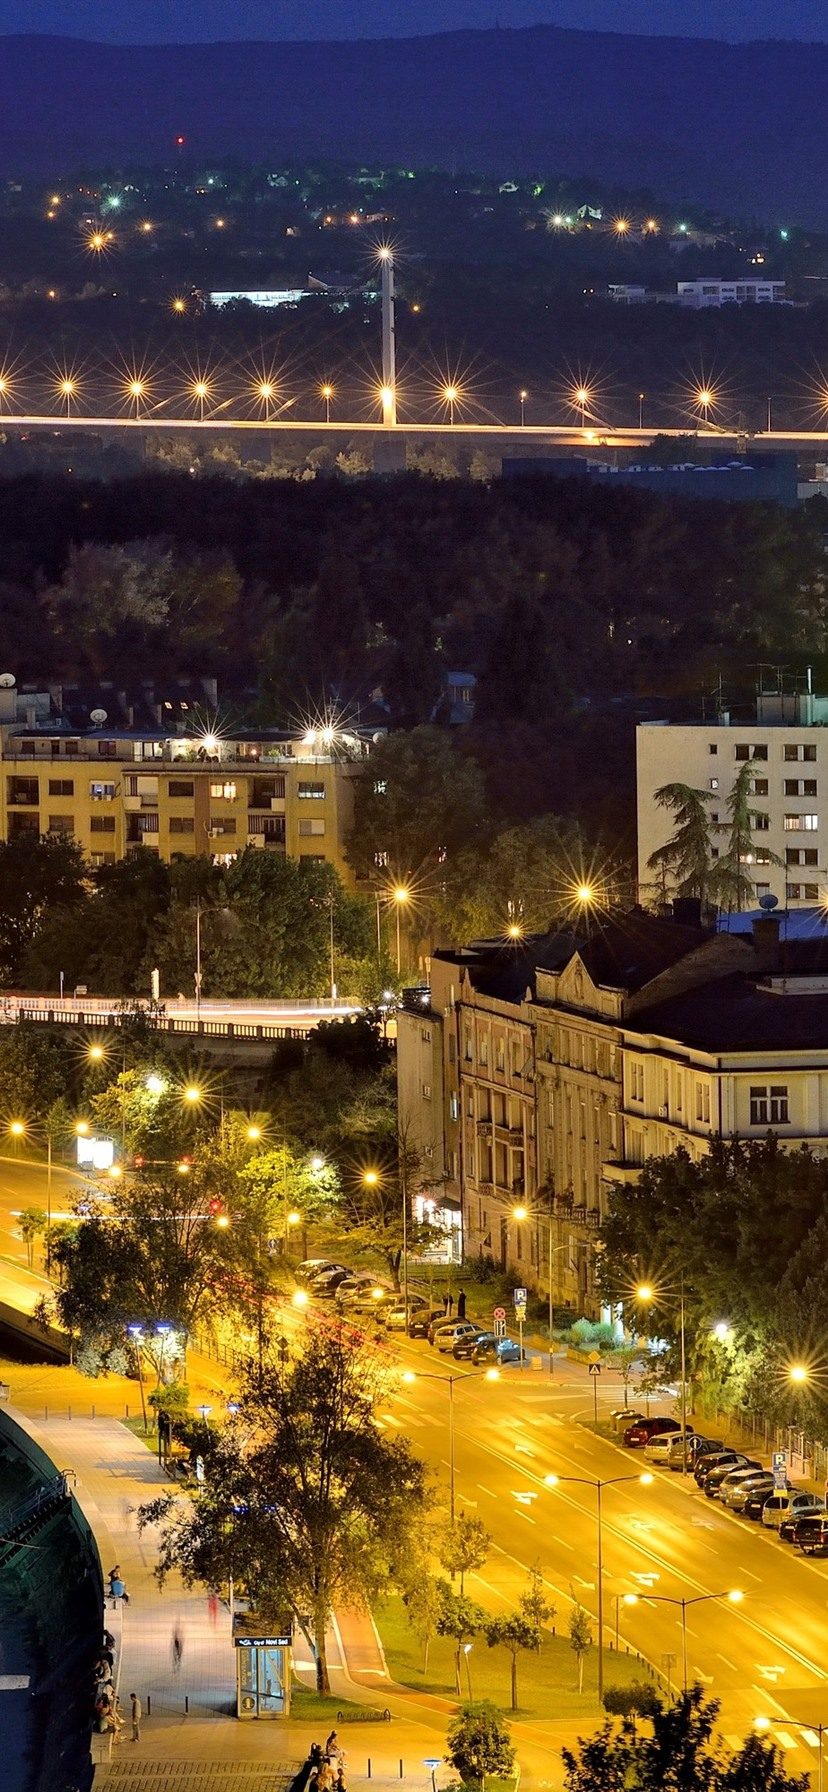 Serbia Novi Sad City Night River Lights 1080x1920 Iphone 8 7 6 6s Plus Wallpaper Background Picture Image